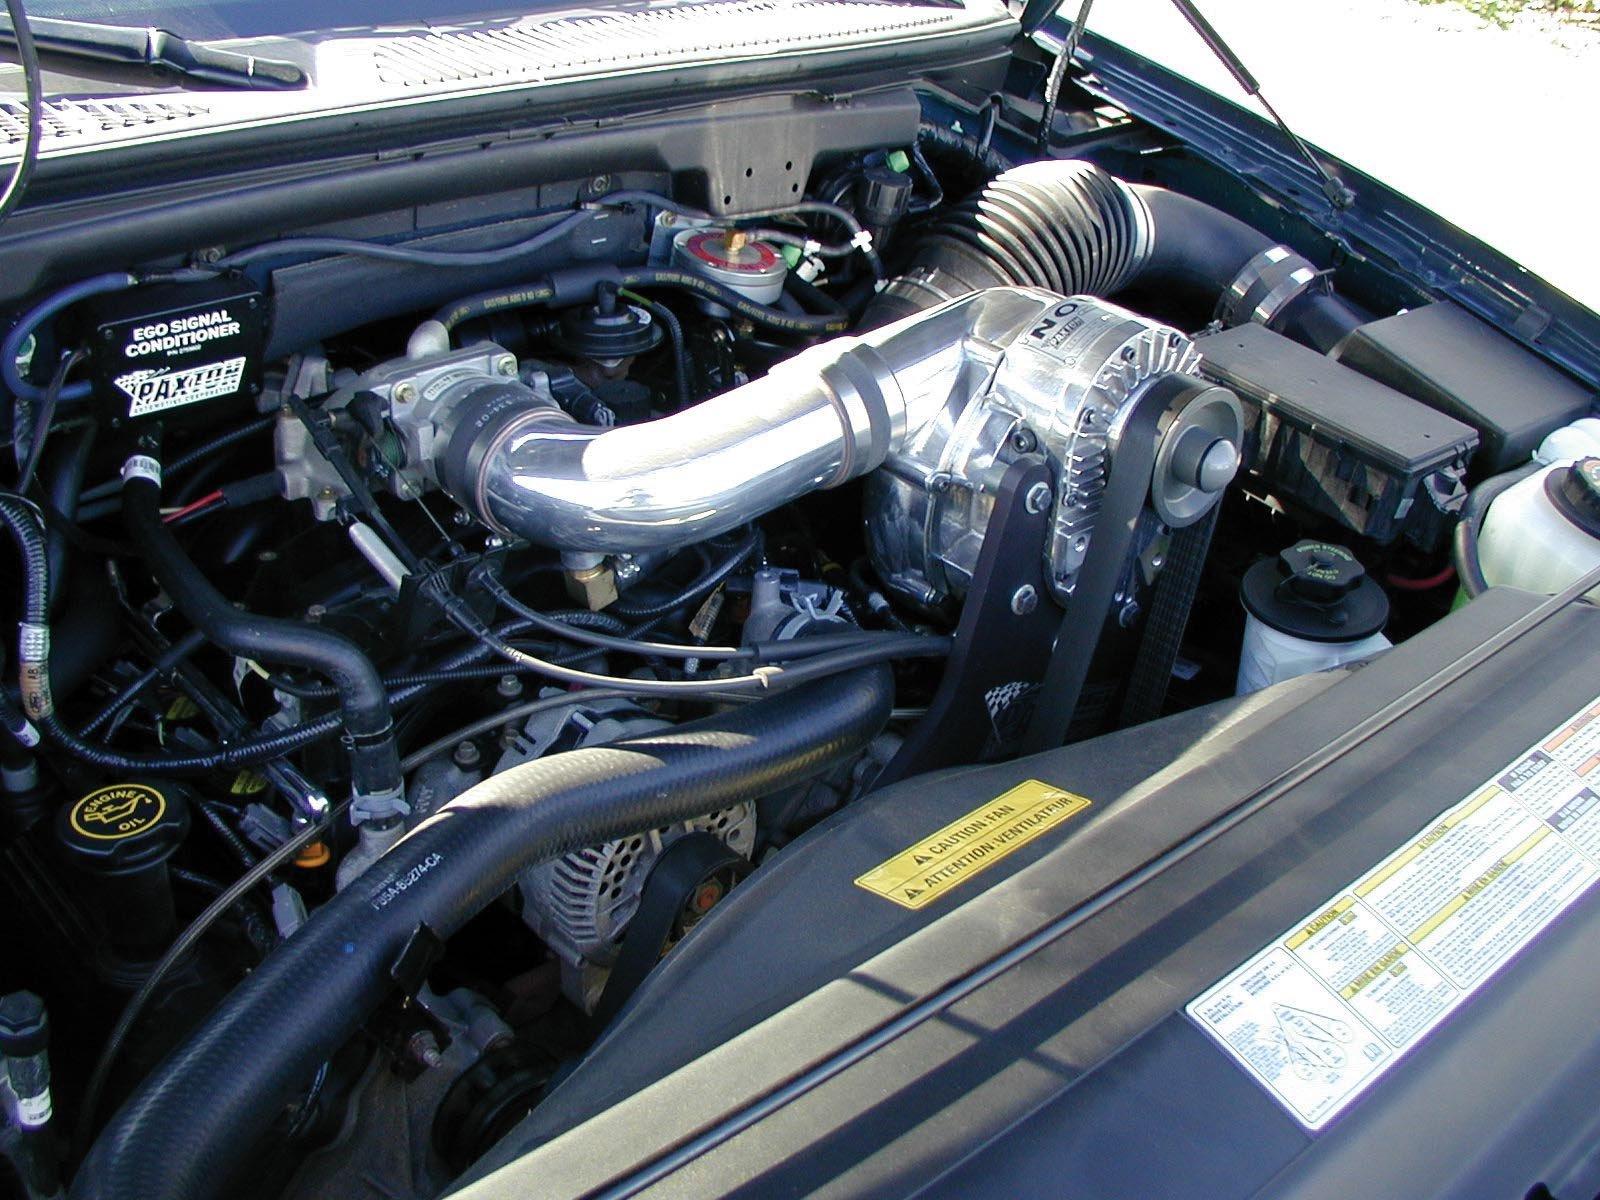 Sensational 2002 Ford F 150 5 4L Engine Diagram Wiring Library Wiring Cloud Monangrecoveryedborg